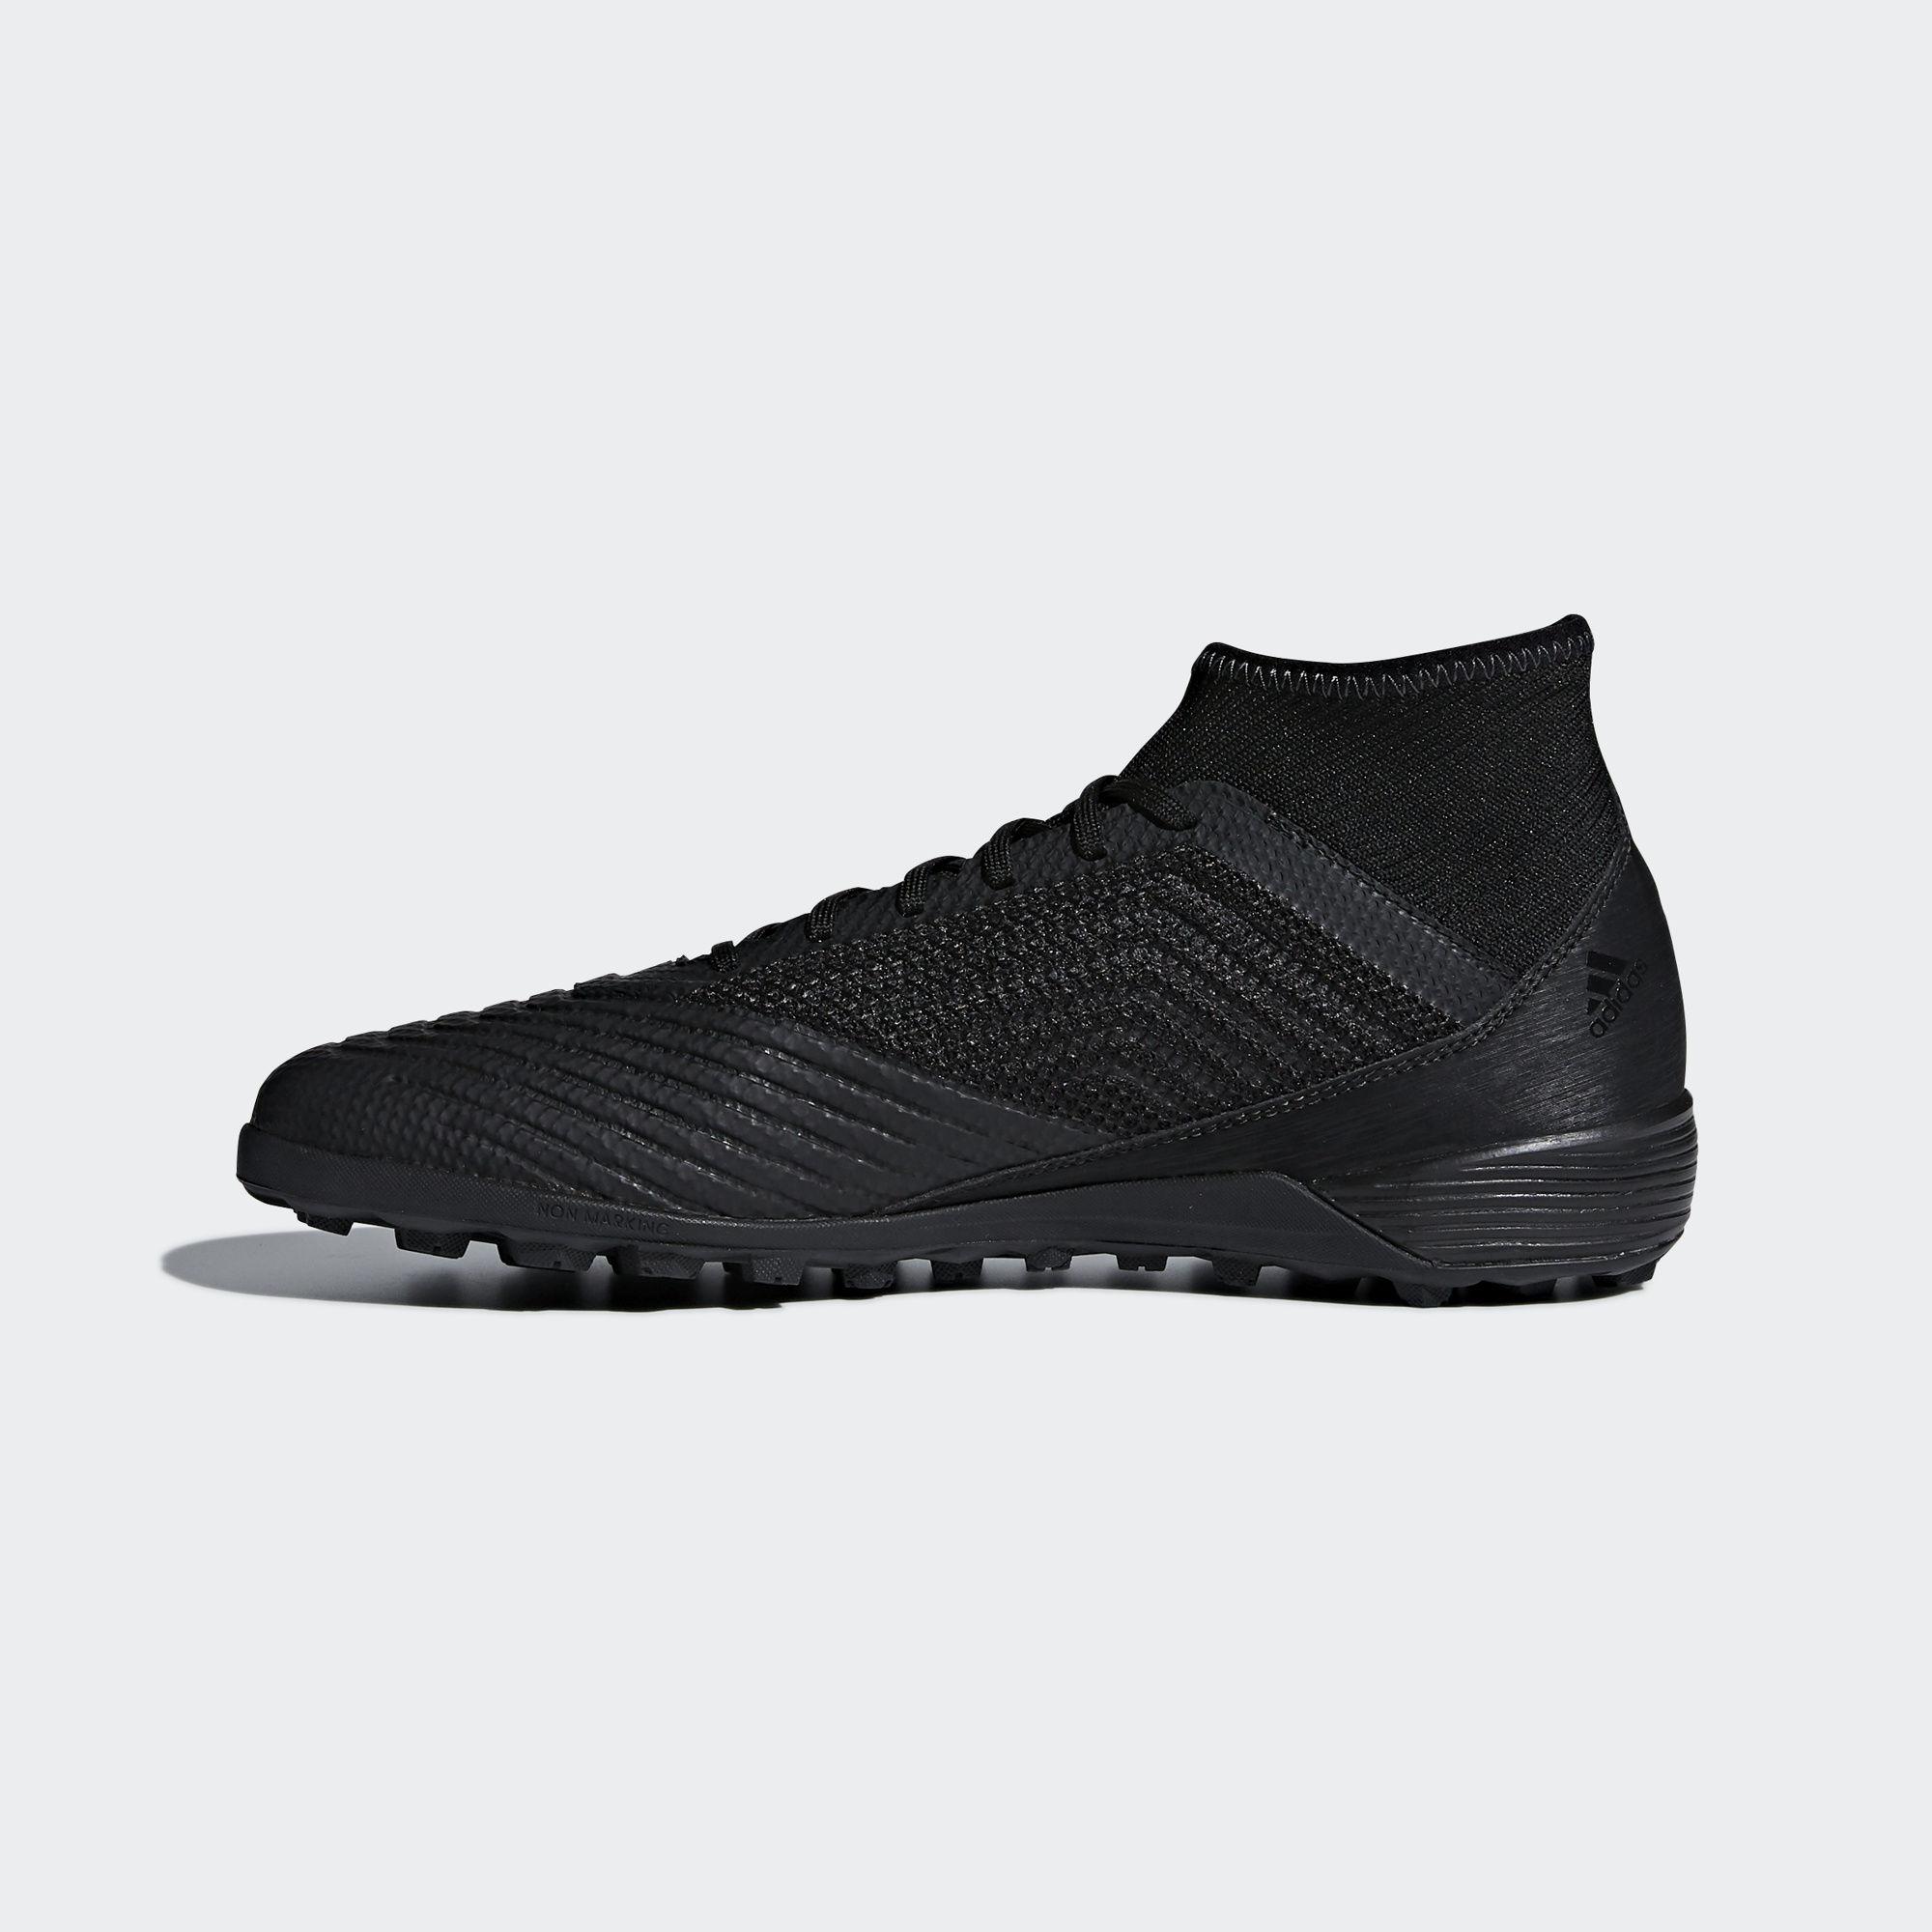 ... Click to enlarge image  adidas predator tango 18.3 tf nite crawler core black utility black core black g.jpg  ... 0d9217d887